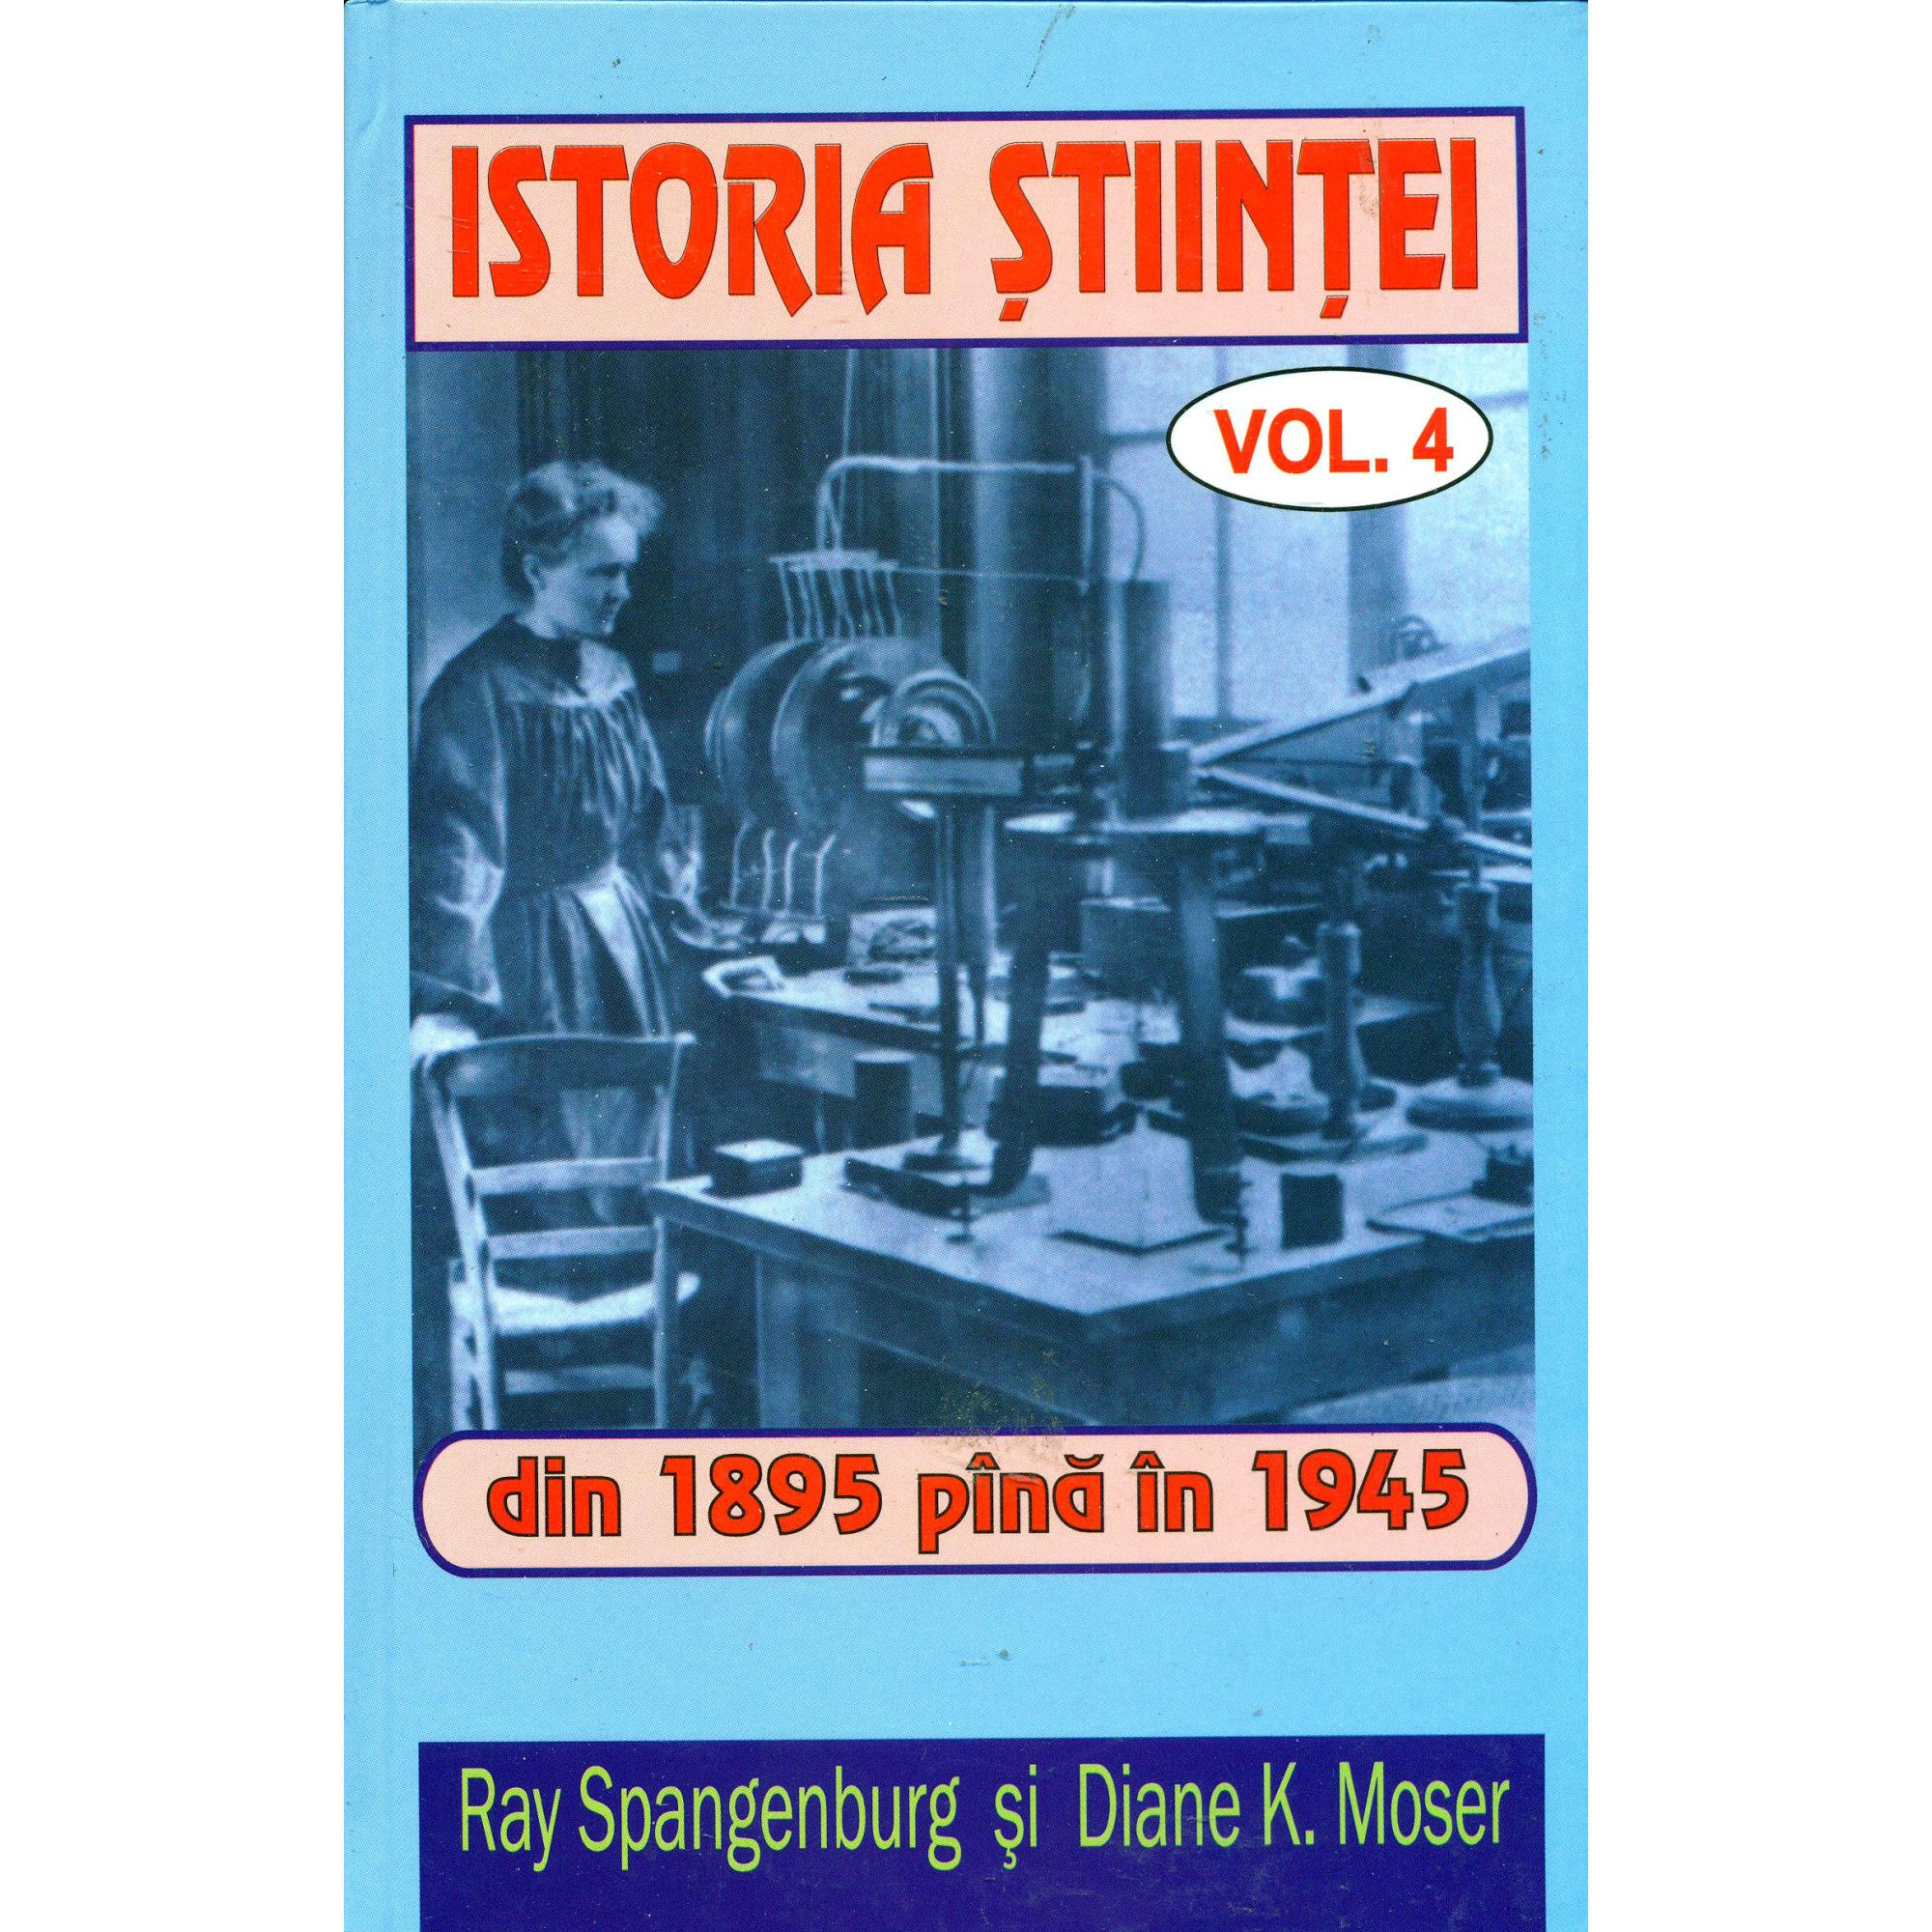 Istoria stiintei vol. 4|Din 1895 pana in 1945